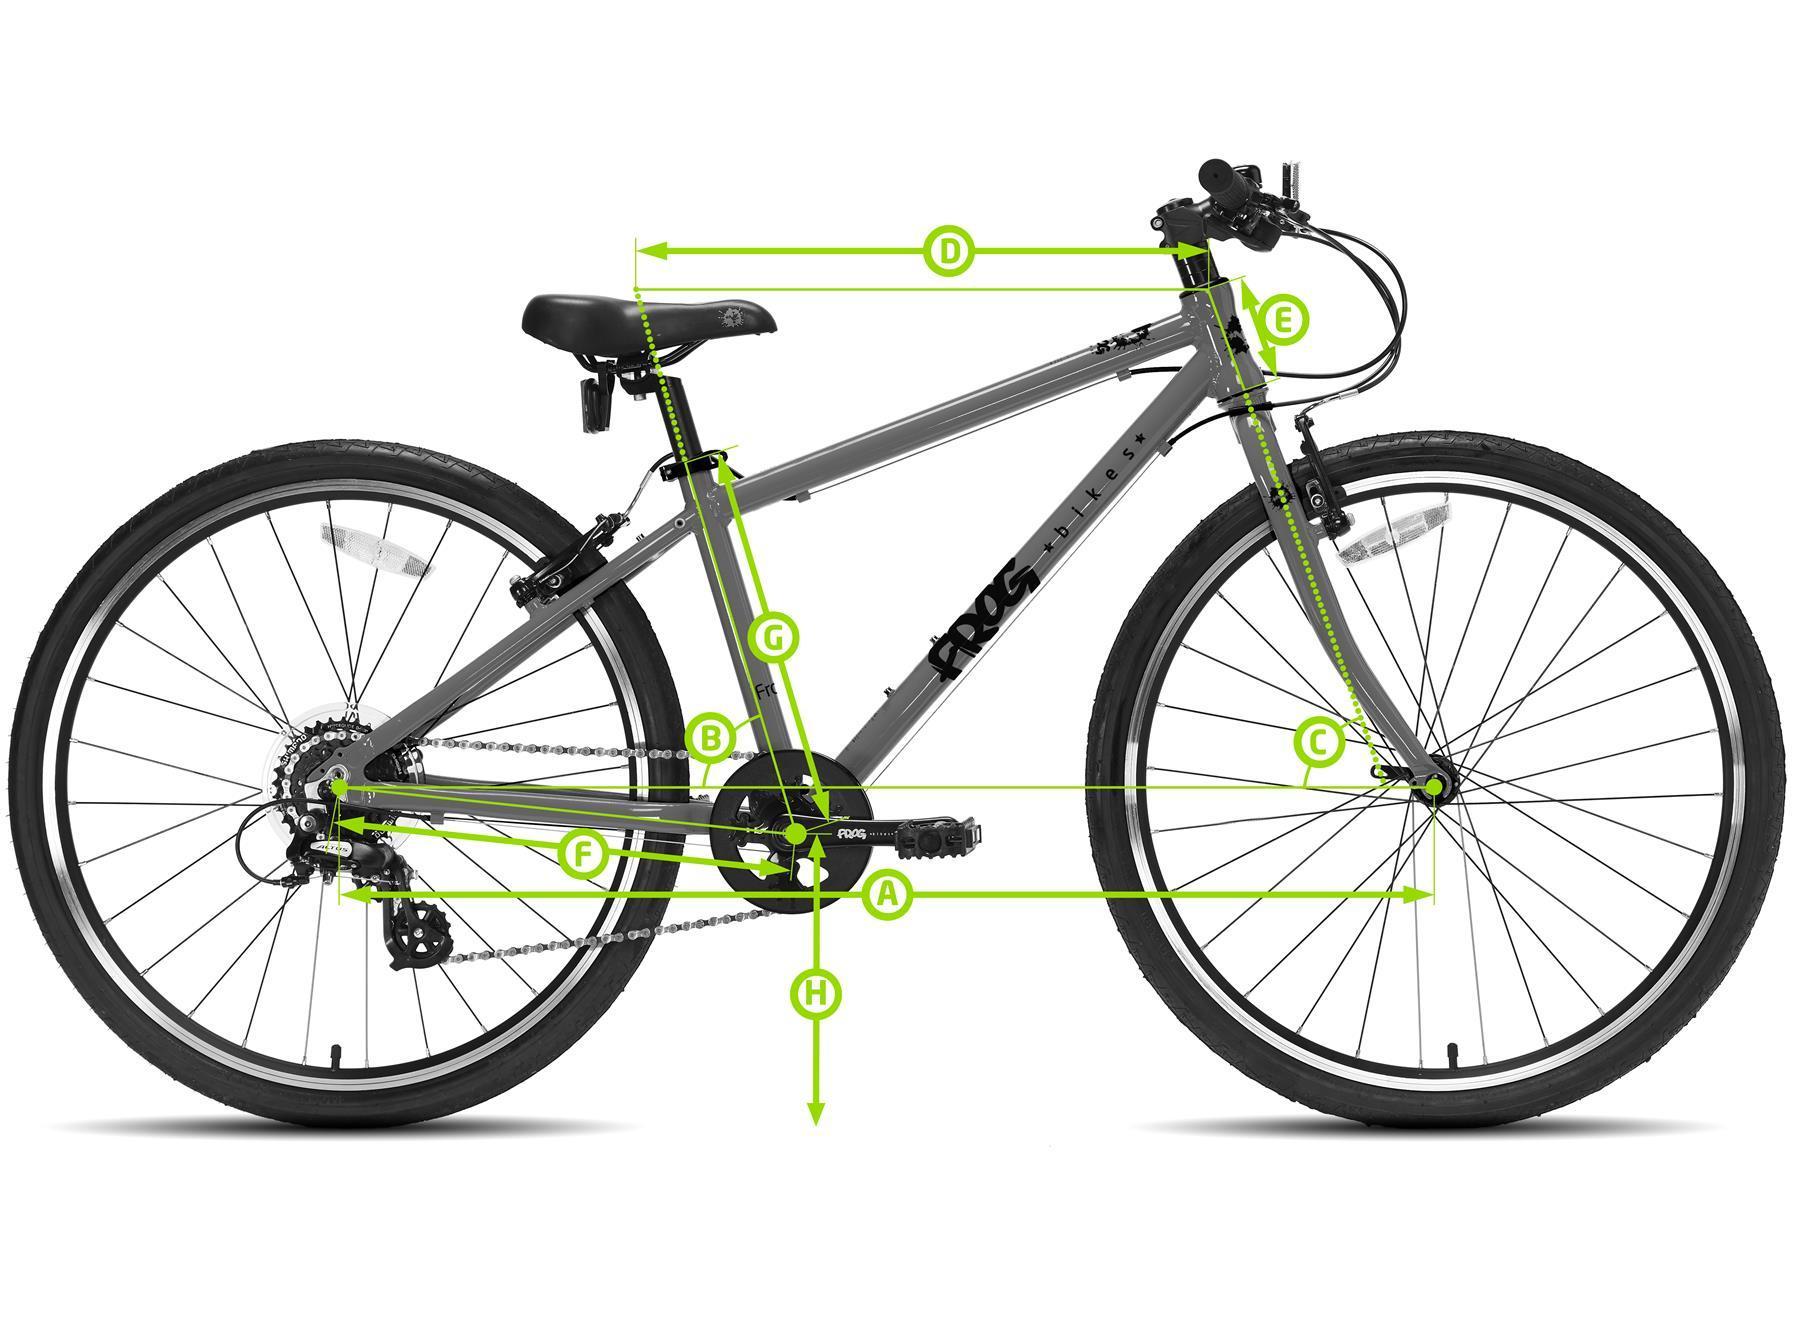 Frog First Pedal 62 Bike Geometry